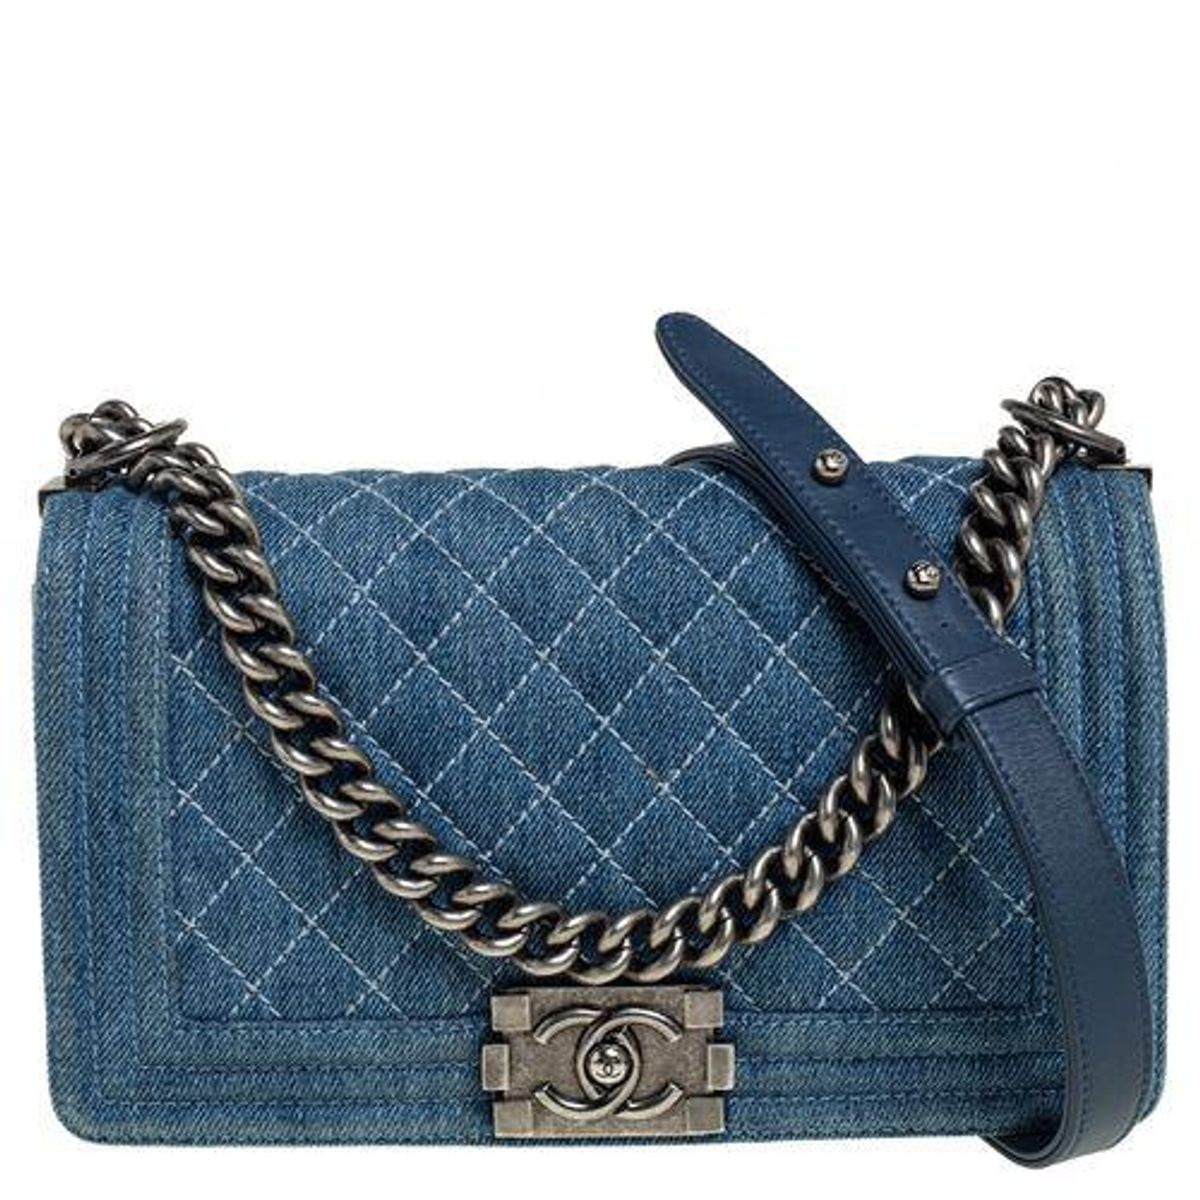 Boy Handbag